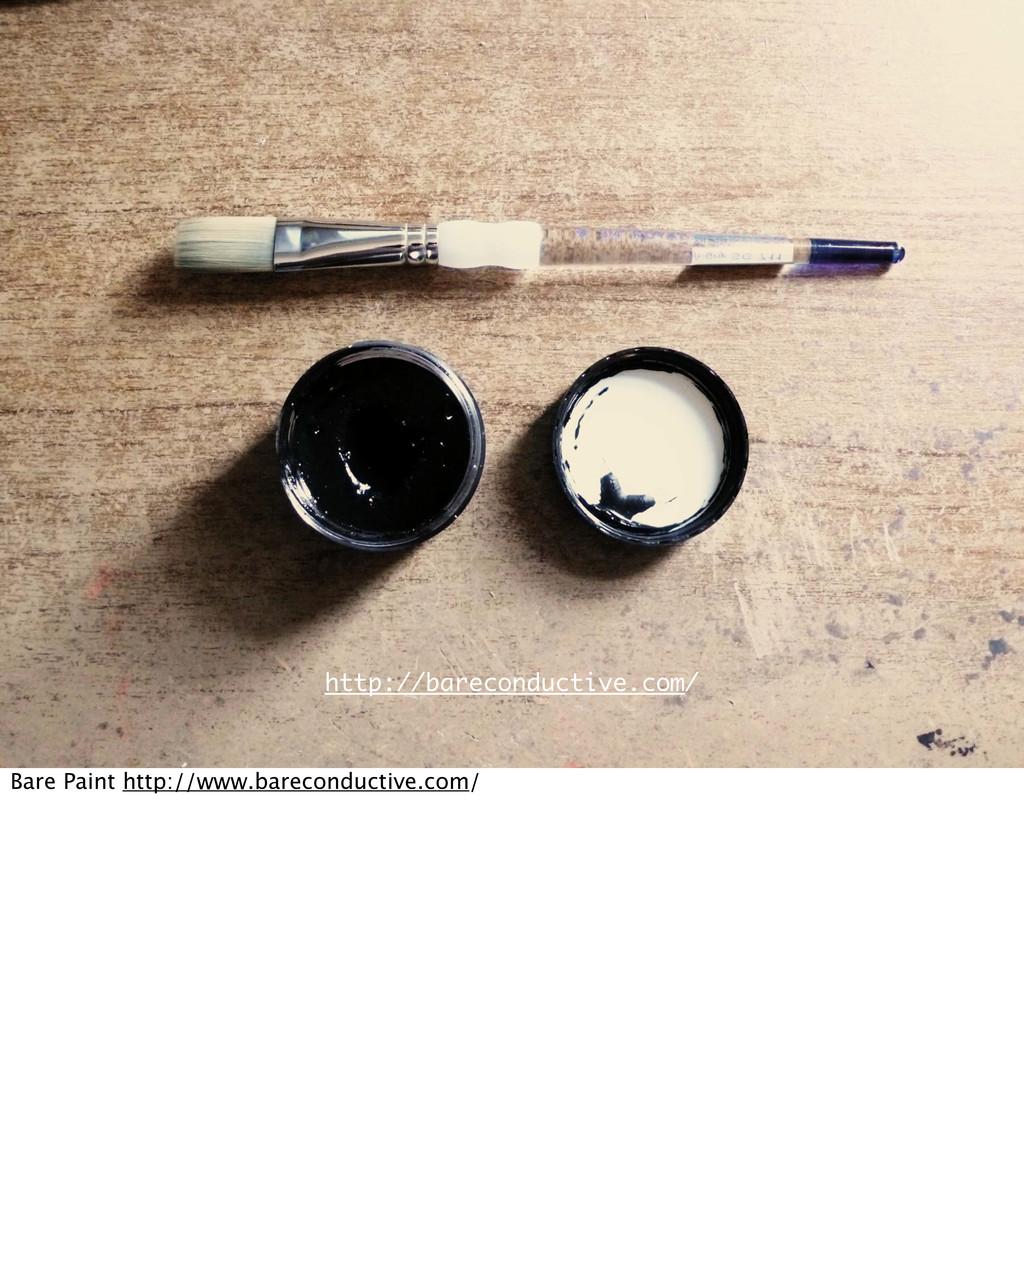 http://bareconductive.com/ Bare Paint http://ww...